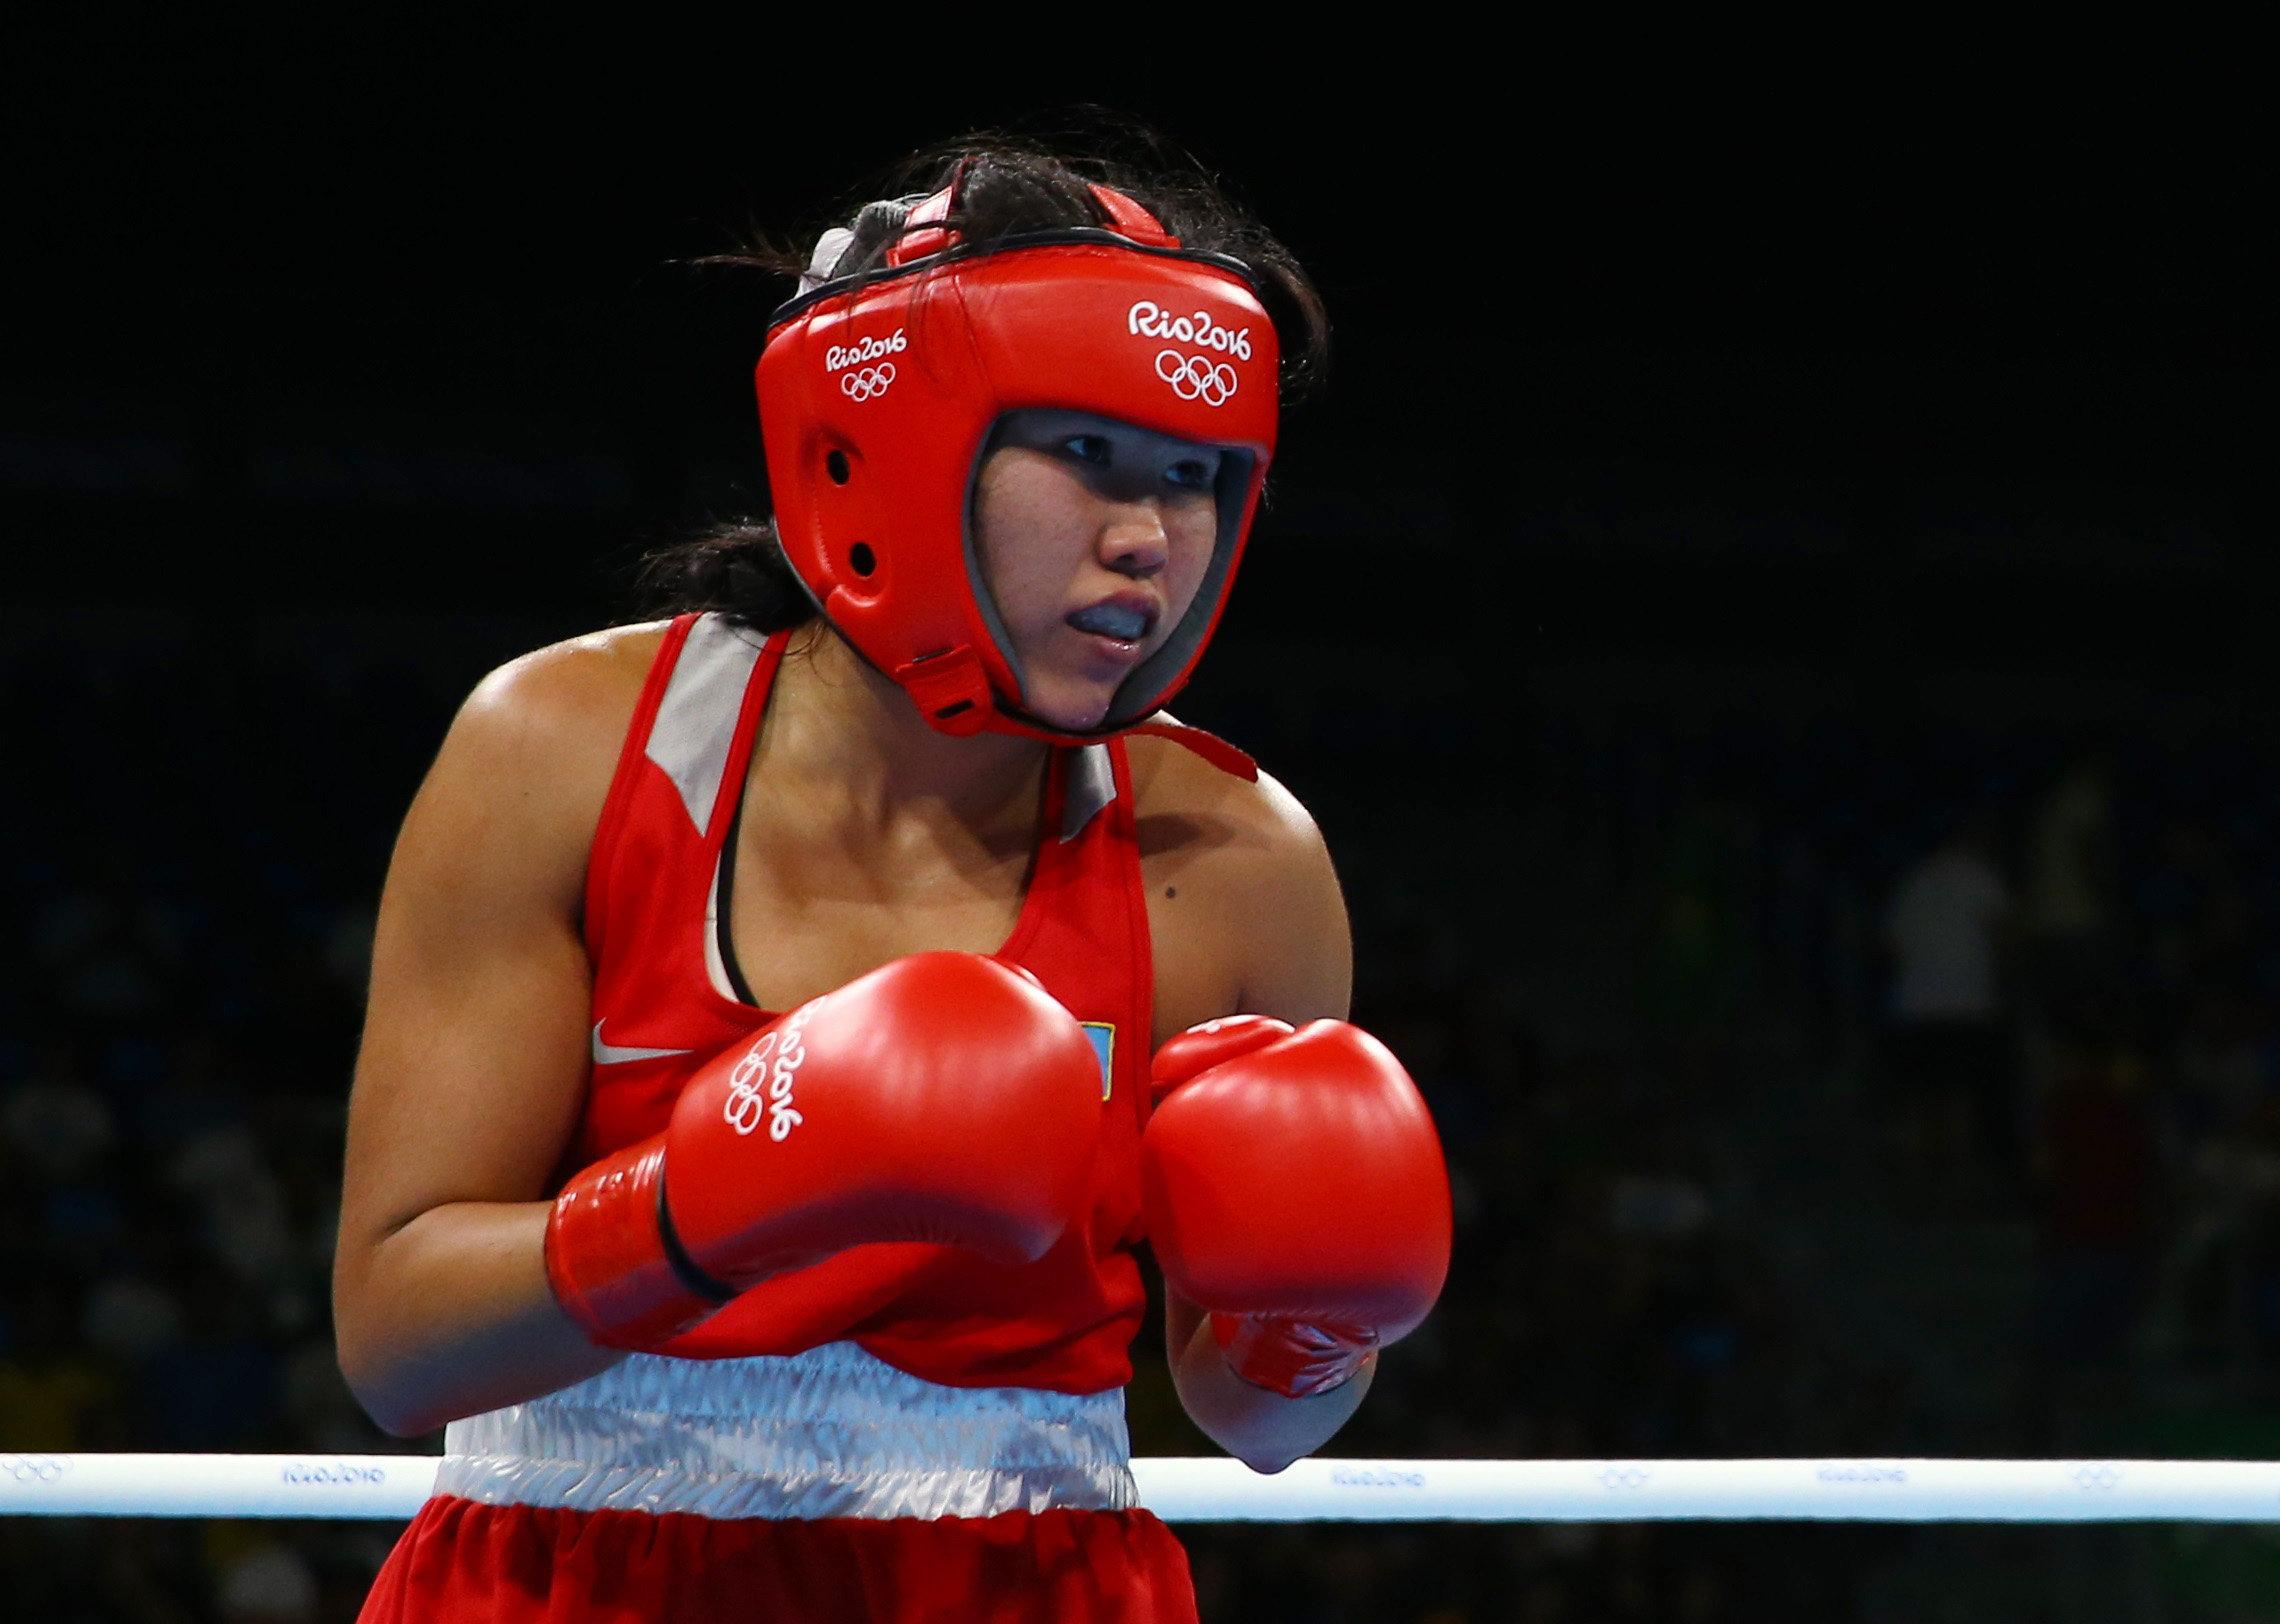 Казахстанская боксерша Дарига Шакимова